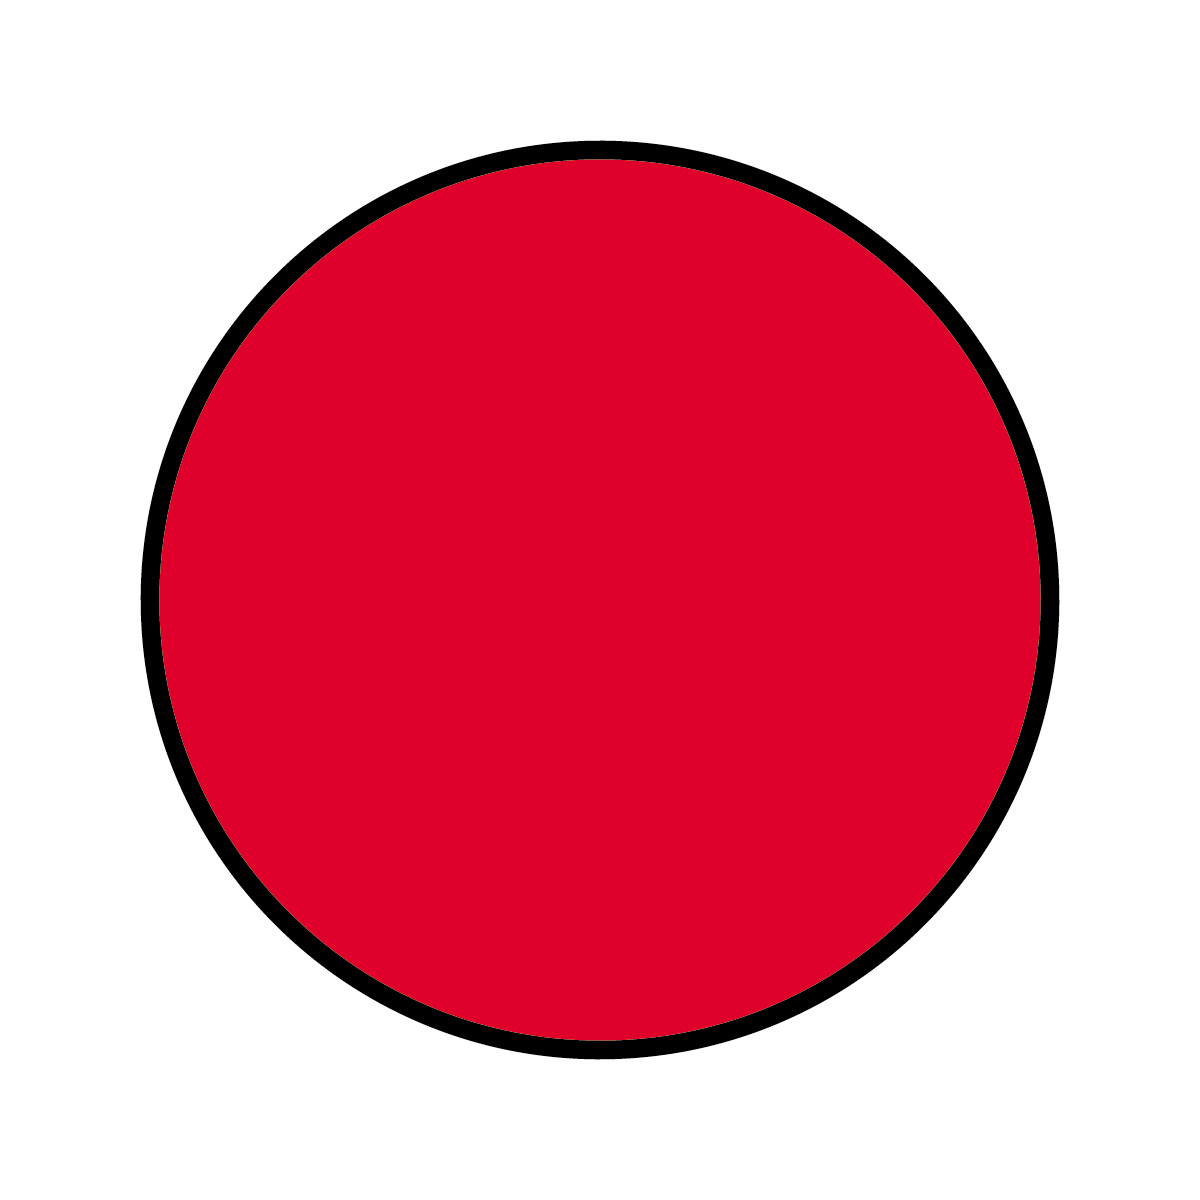 Round Shape Clipart - Clipart Suggest